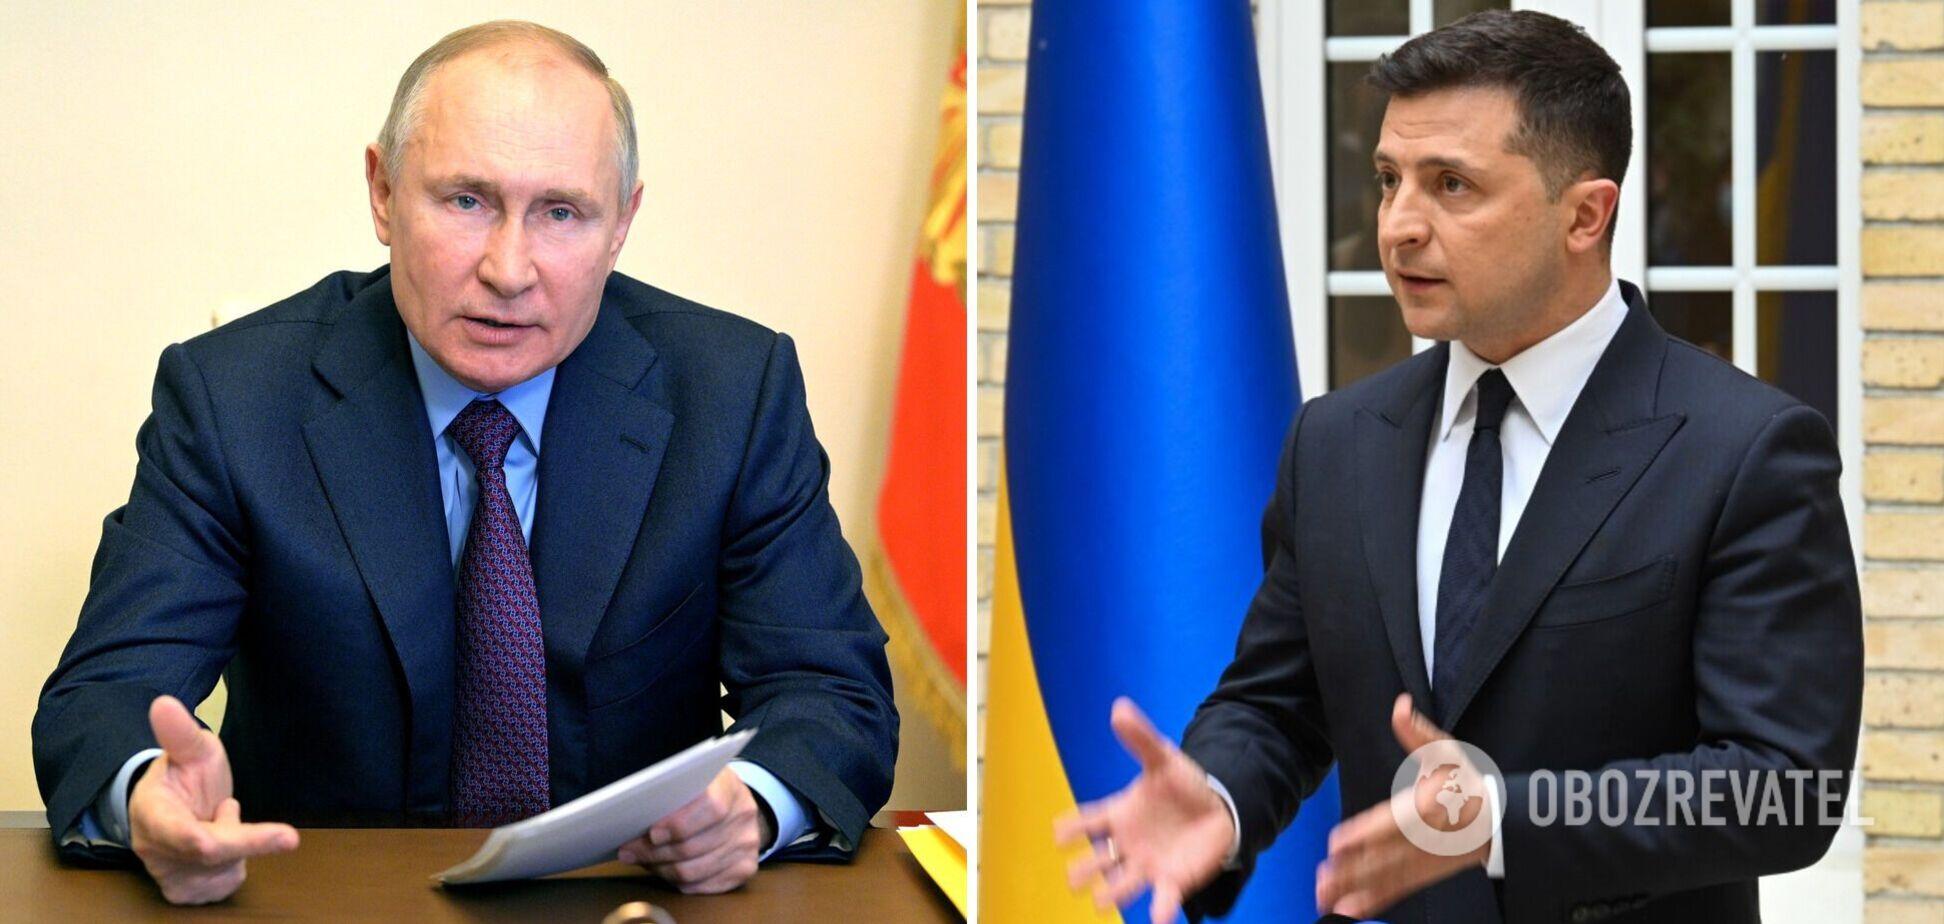 Путин ответил Зеленскому: встречу предложил не на Донбассе. Видео